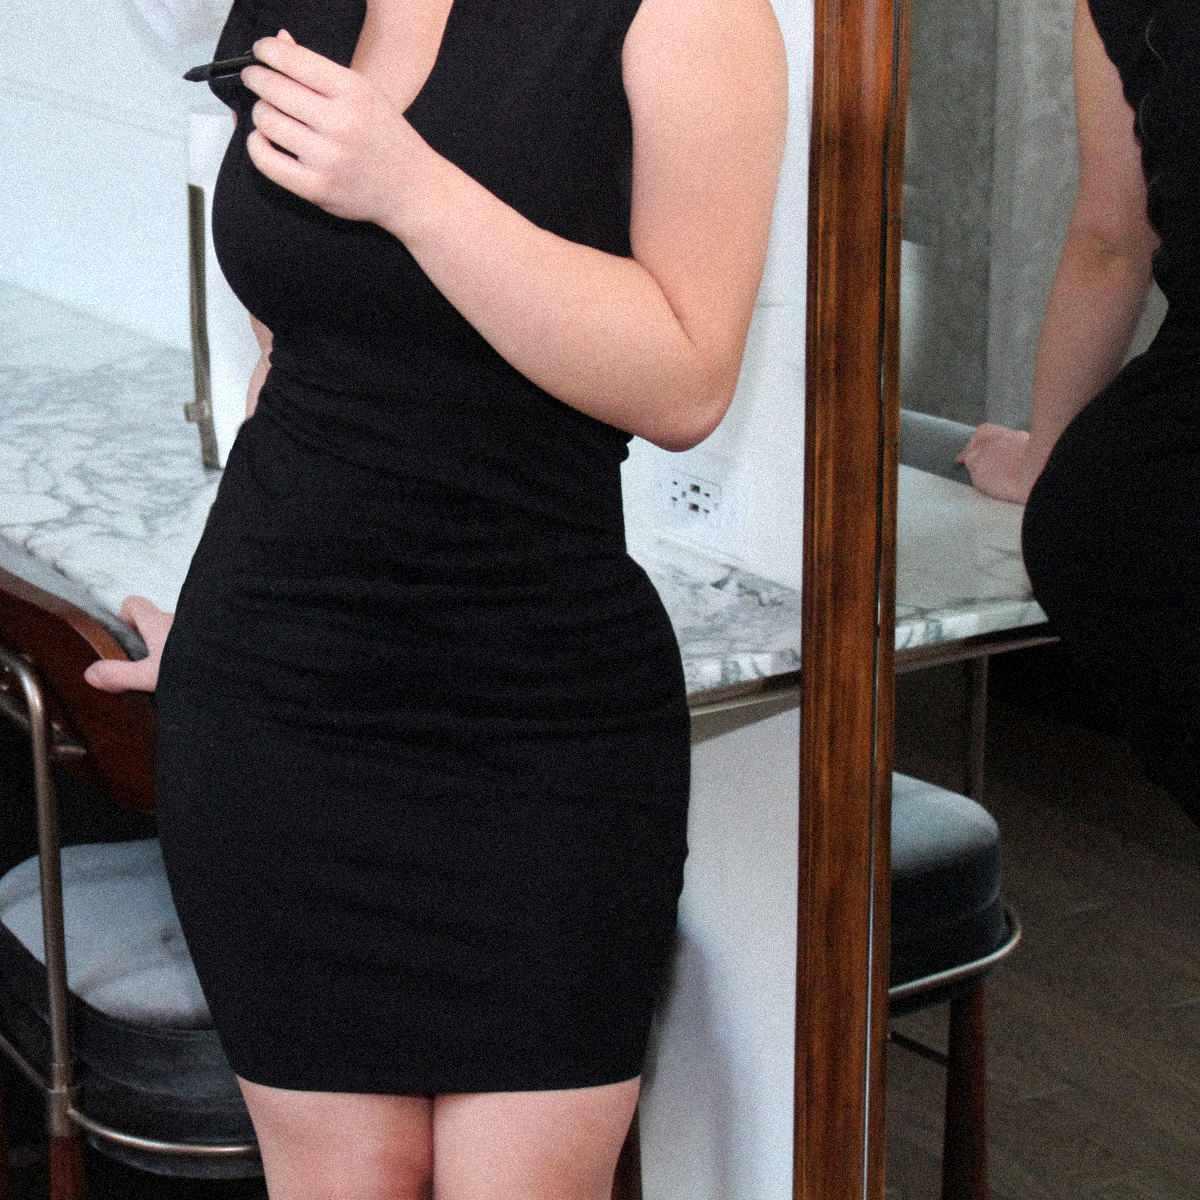 Image of Leisure Model Morgan of Las Vegas